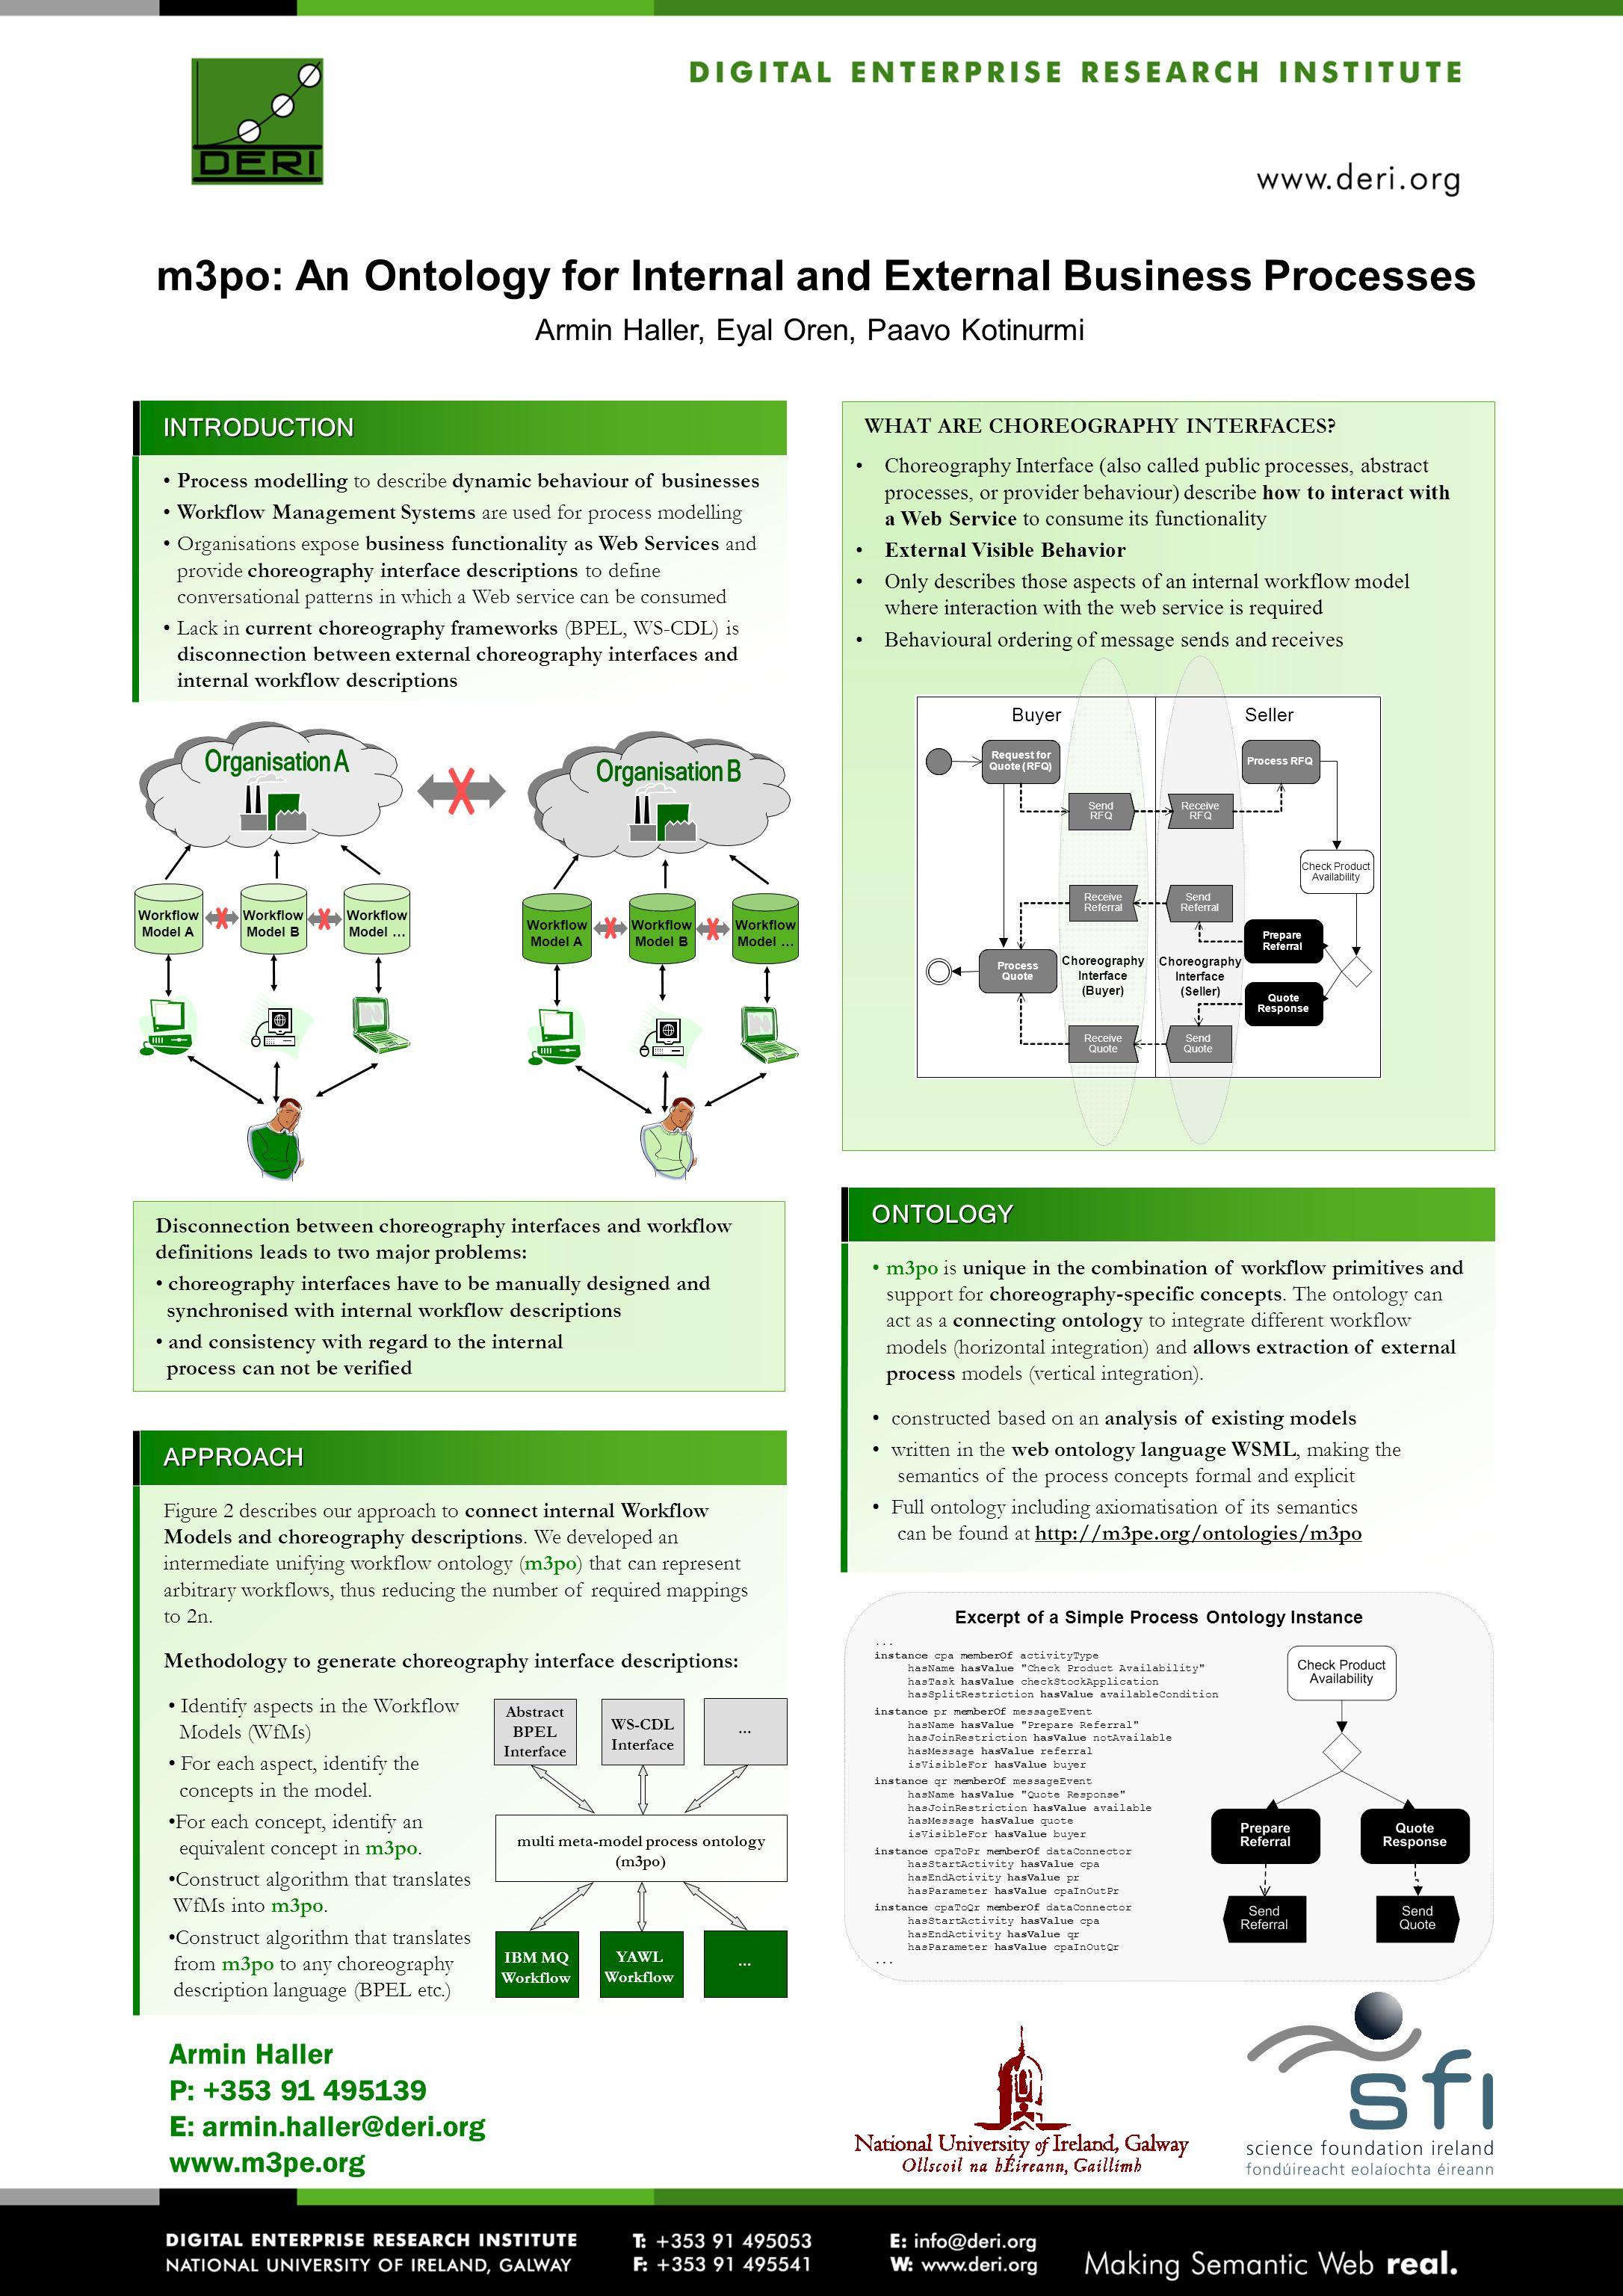 m3po: An Ontology for Internal and External Business Processes Armin Haller P: +353 91 495139 E: armin.haller@deri.org www.m3pe.org Process modelling